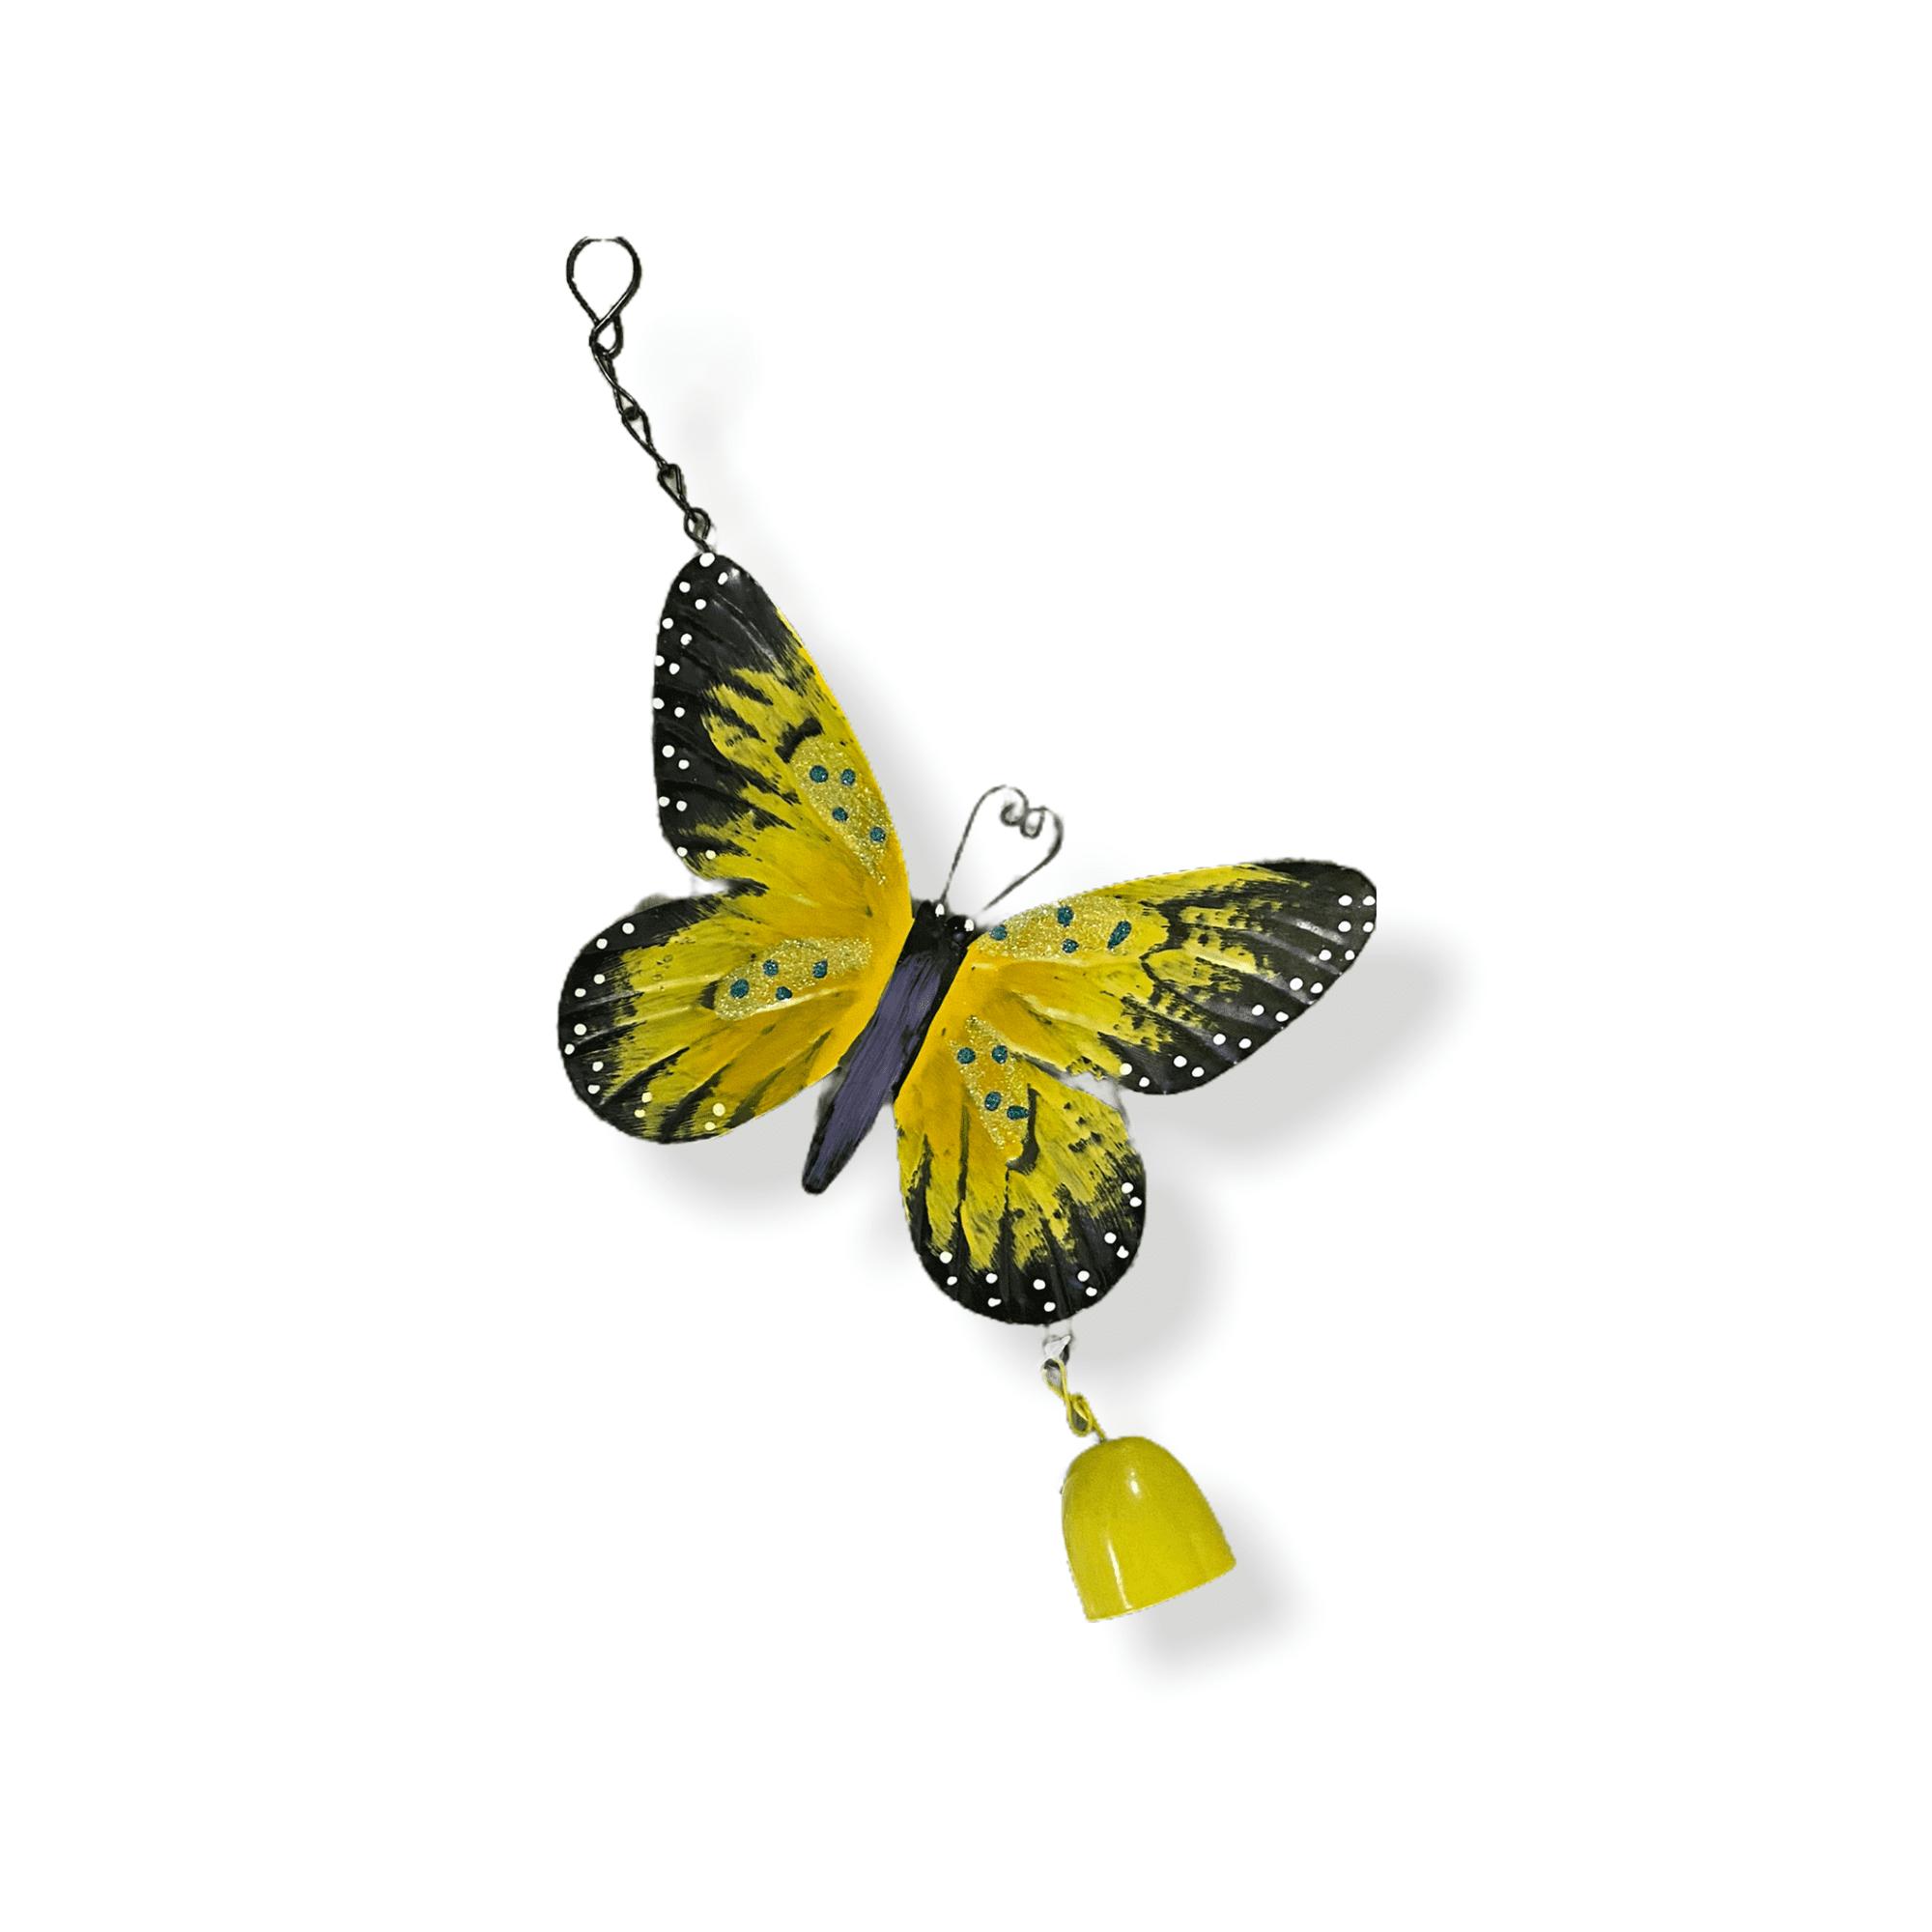 Gartenhänger Schmetterling  gelb